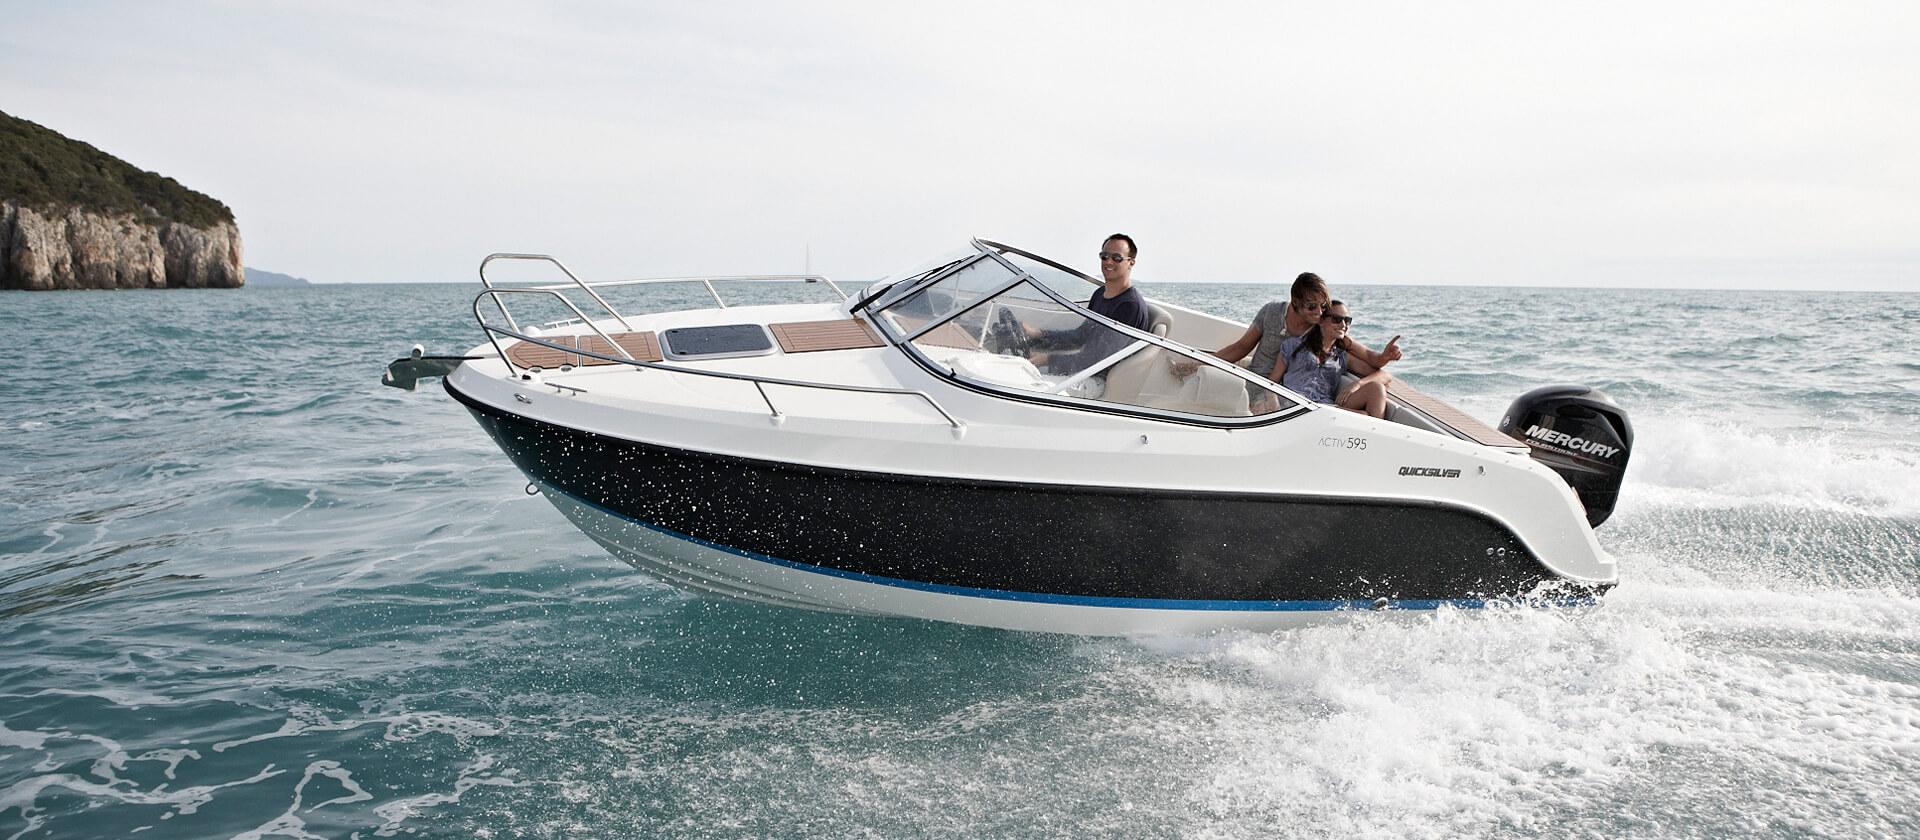 595 Cruiser